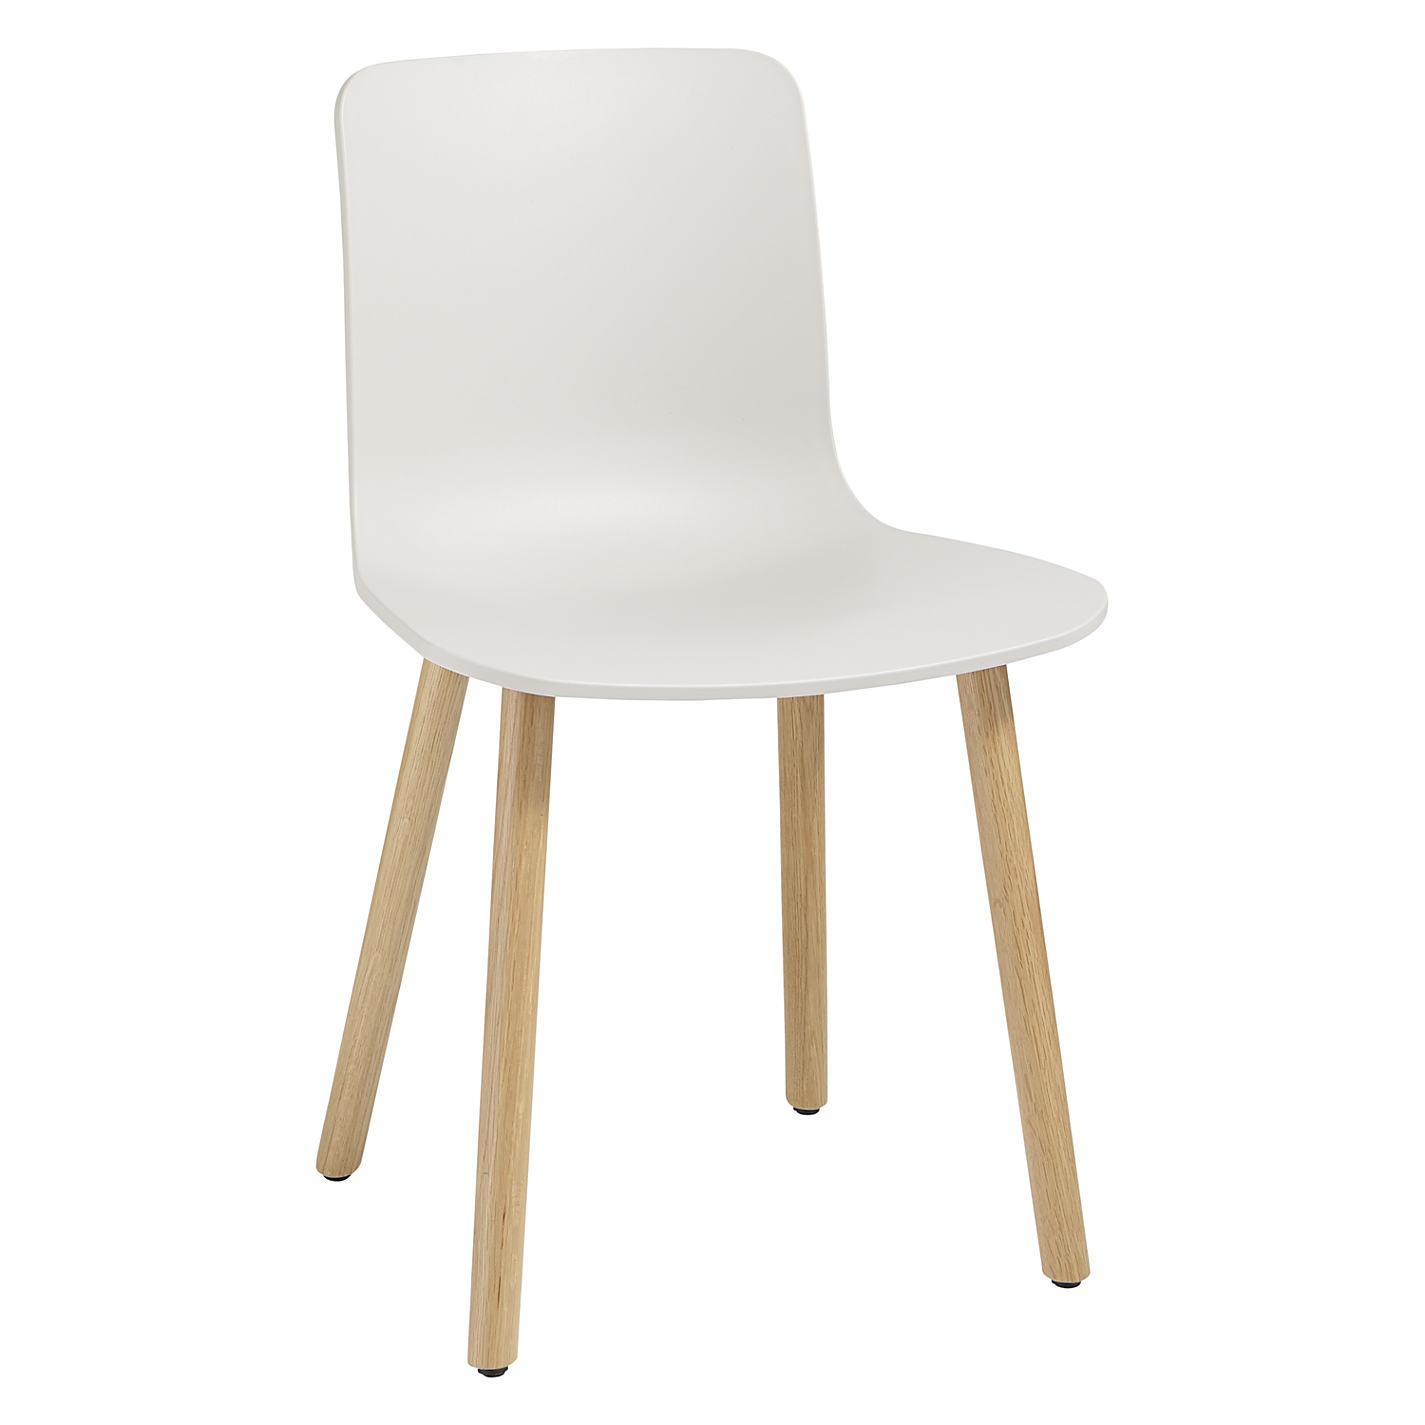 Buy Vitra HAL Chair | John Lewis